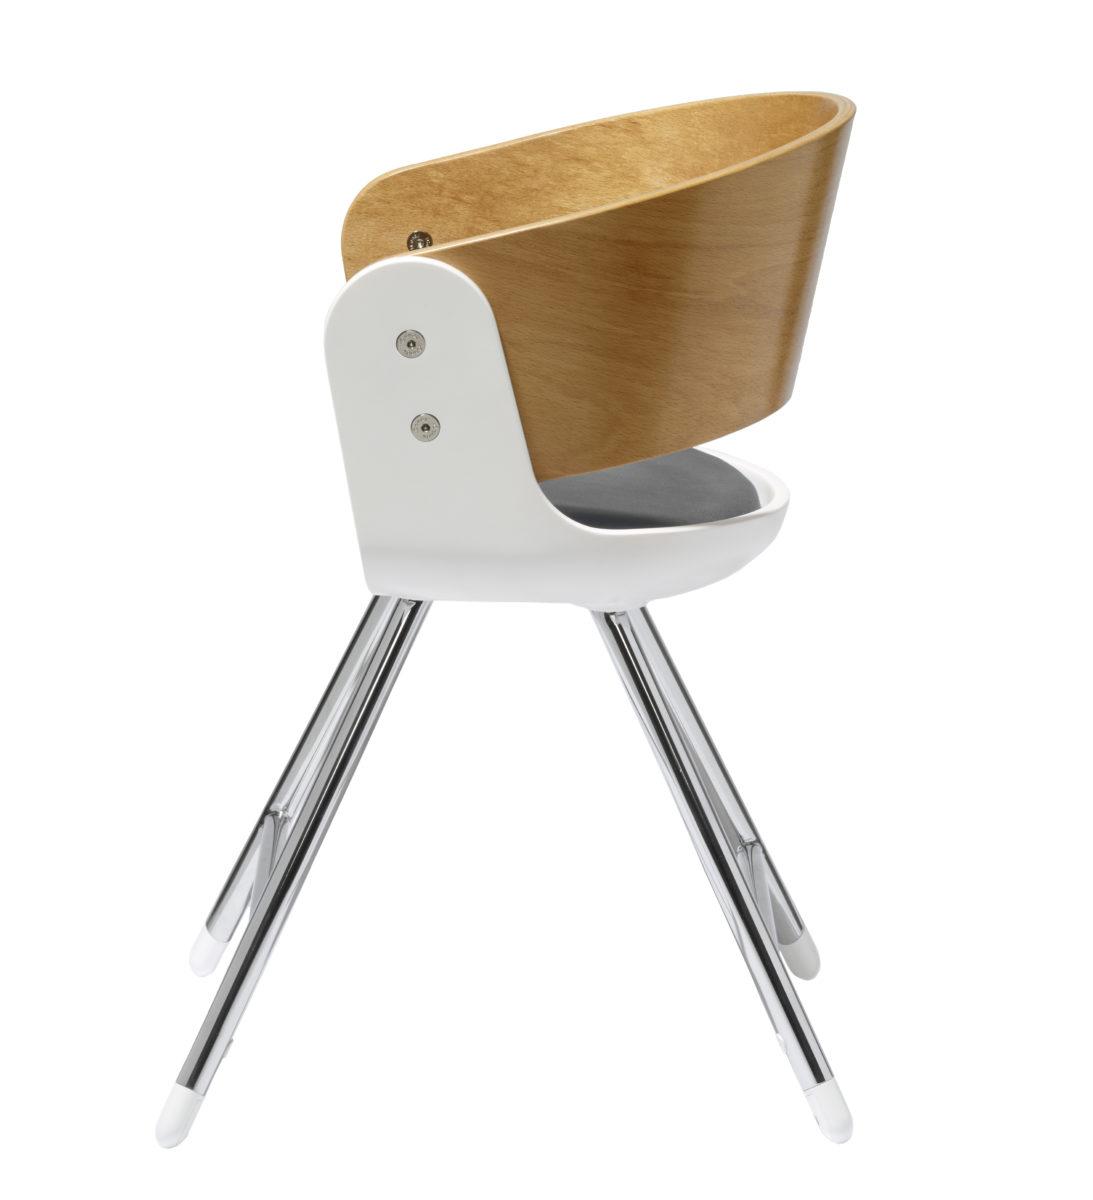 iCandy Mi Chair Small Chair – Flint-jpg